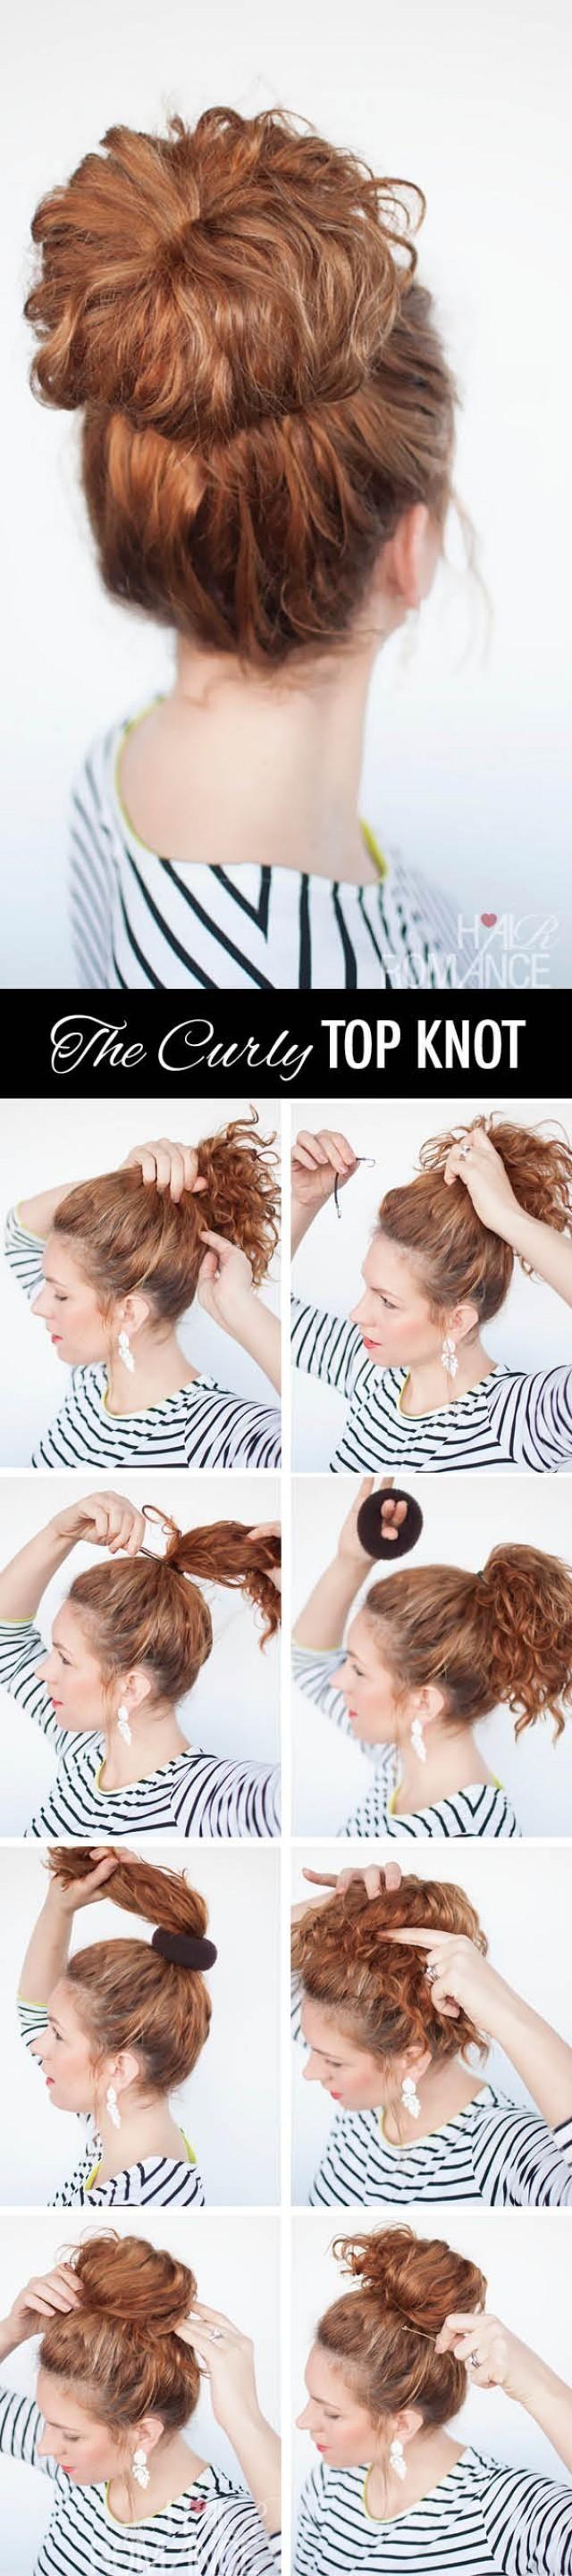 best tutorials images on pinterest hair ideas house